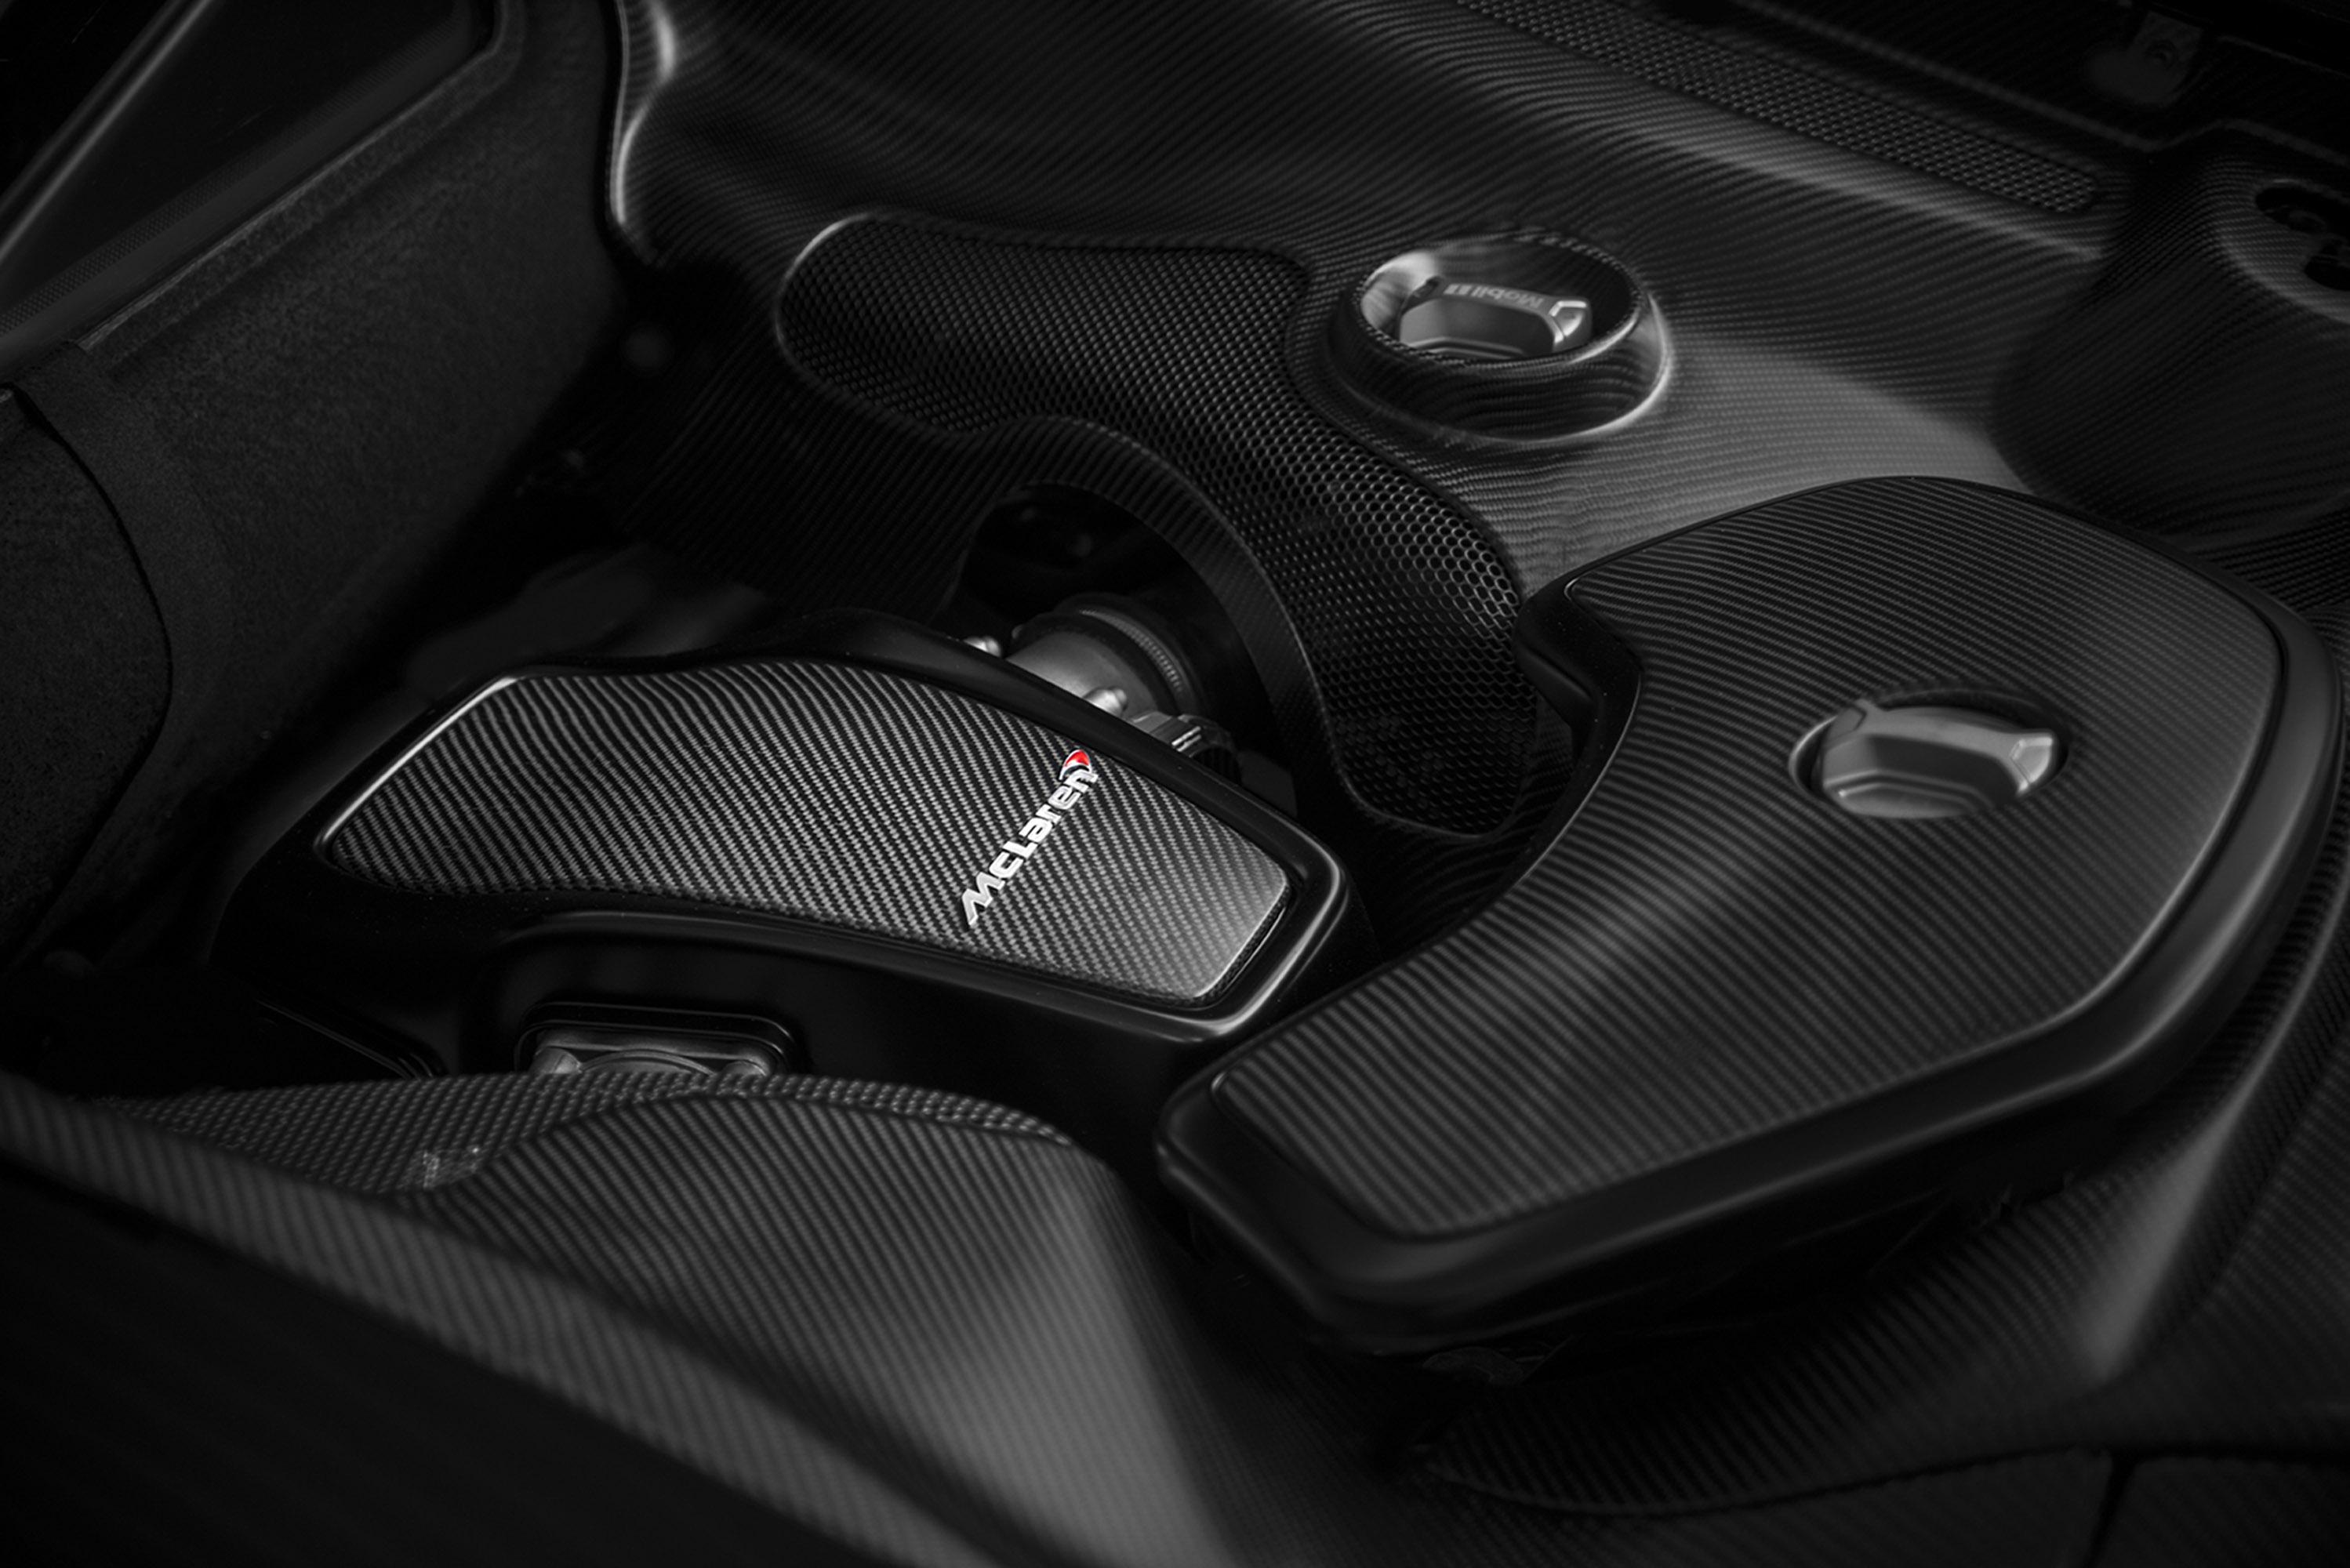 https://www.automobilesreview.com/gallery/mclaren-mso-650s-coupe-concept/mclaren-mso-650s-coupe-concept-07.jpg